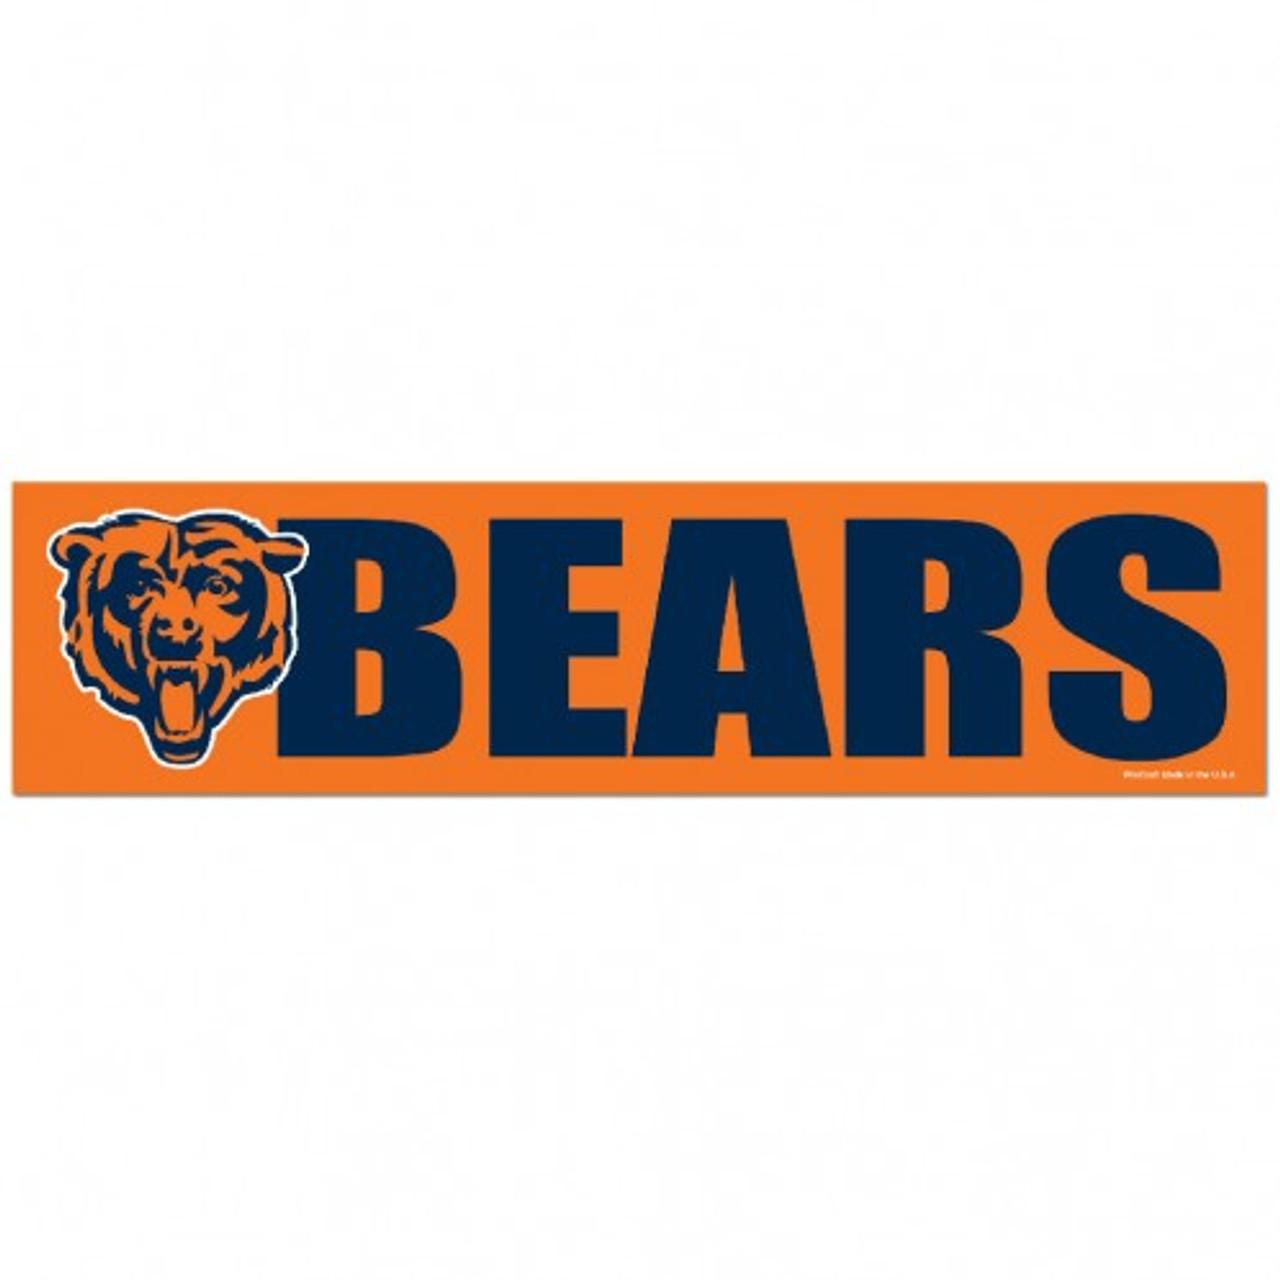 Chicago Bears Bumper strips